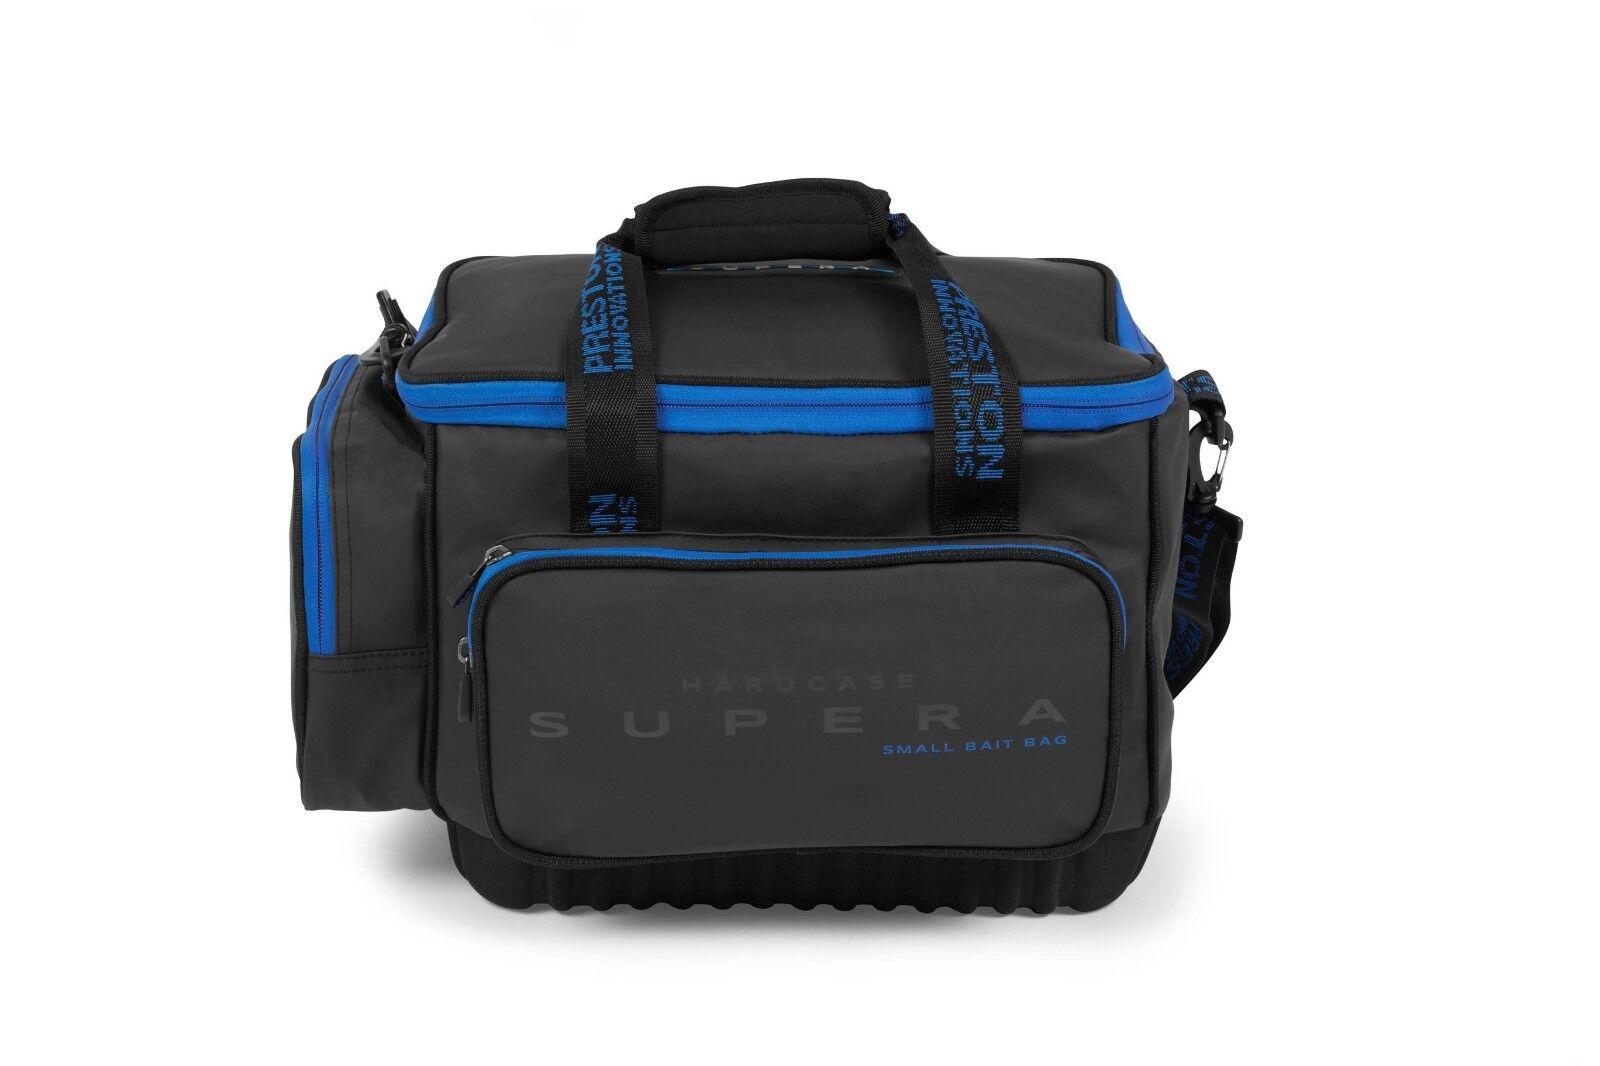 Preston Innovations Supera Small Bait Bag NEW Coarse Fishing Bait Carryall